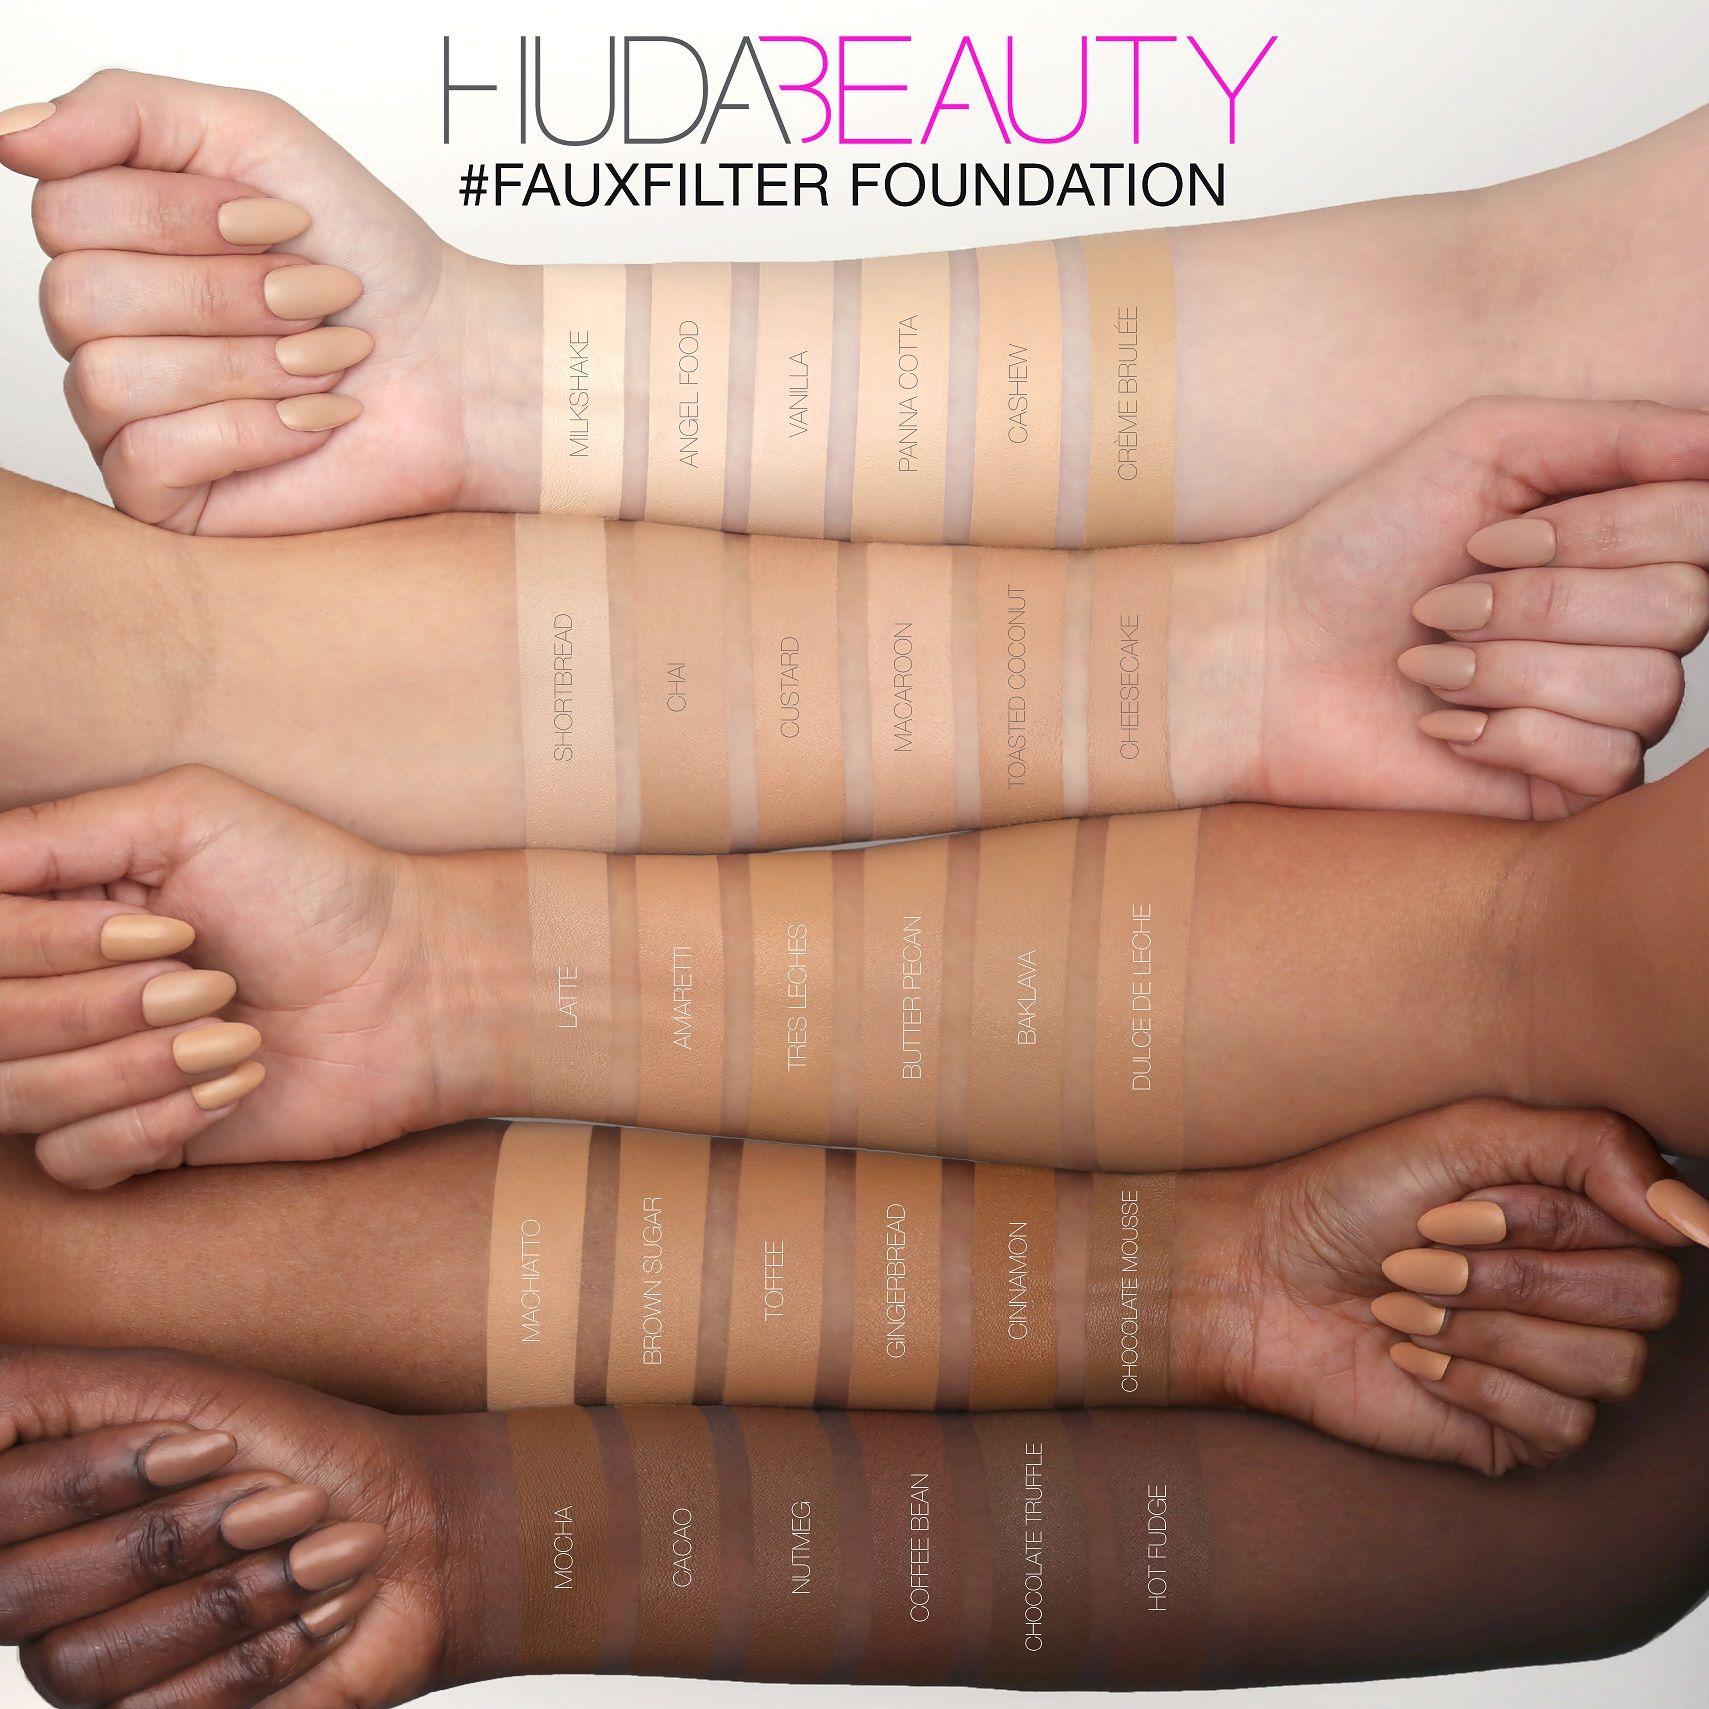 Huda Beautyfauxfilter Tres 35ml 320g Foundation Leches edCrBxo